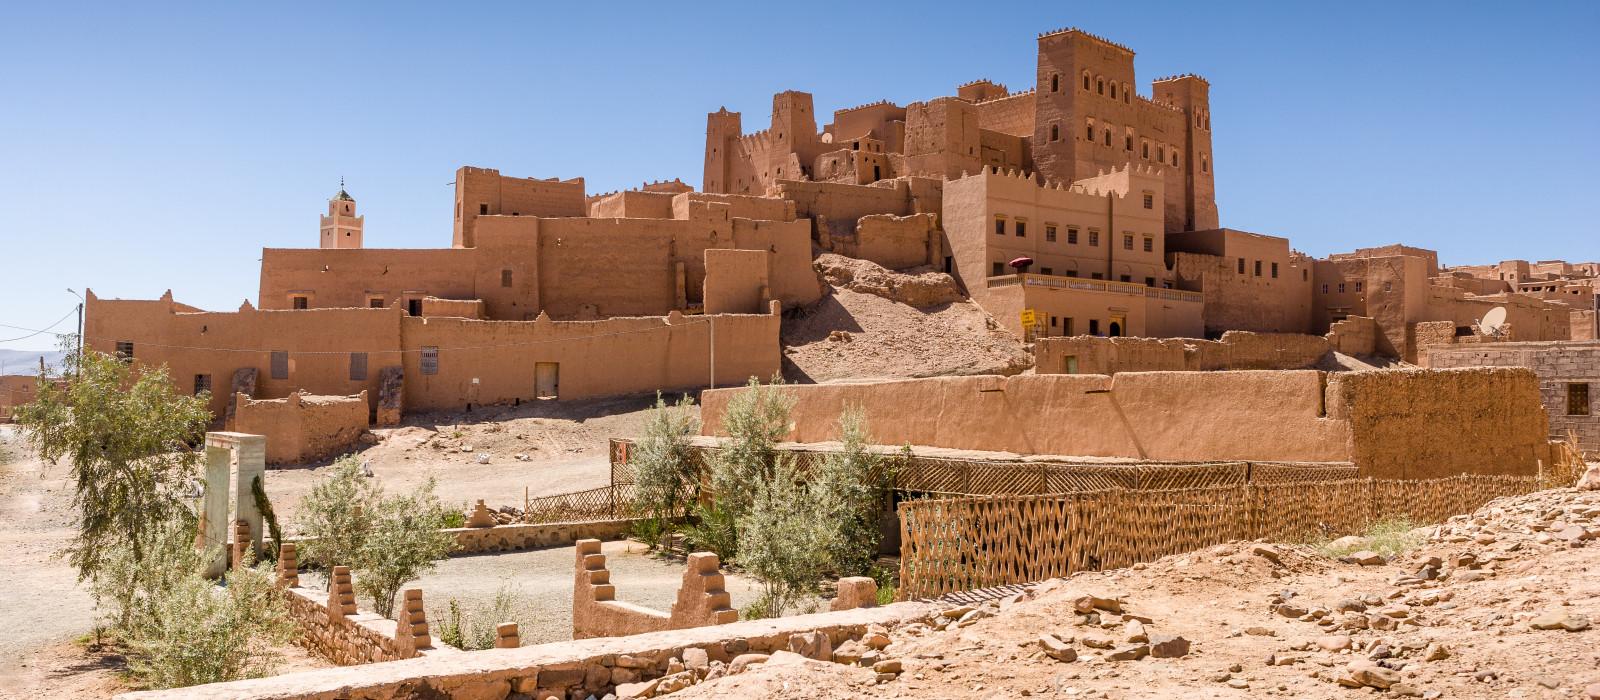 Hotel Riad Lamane Zagora Marokko